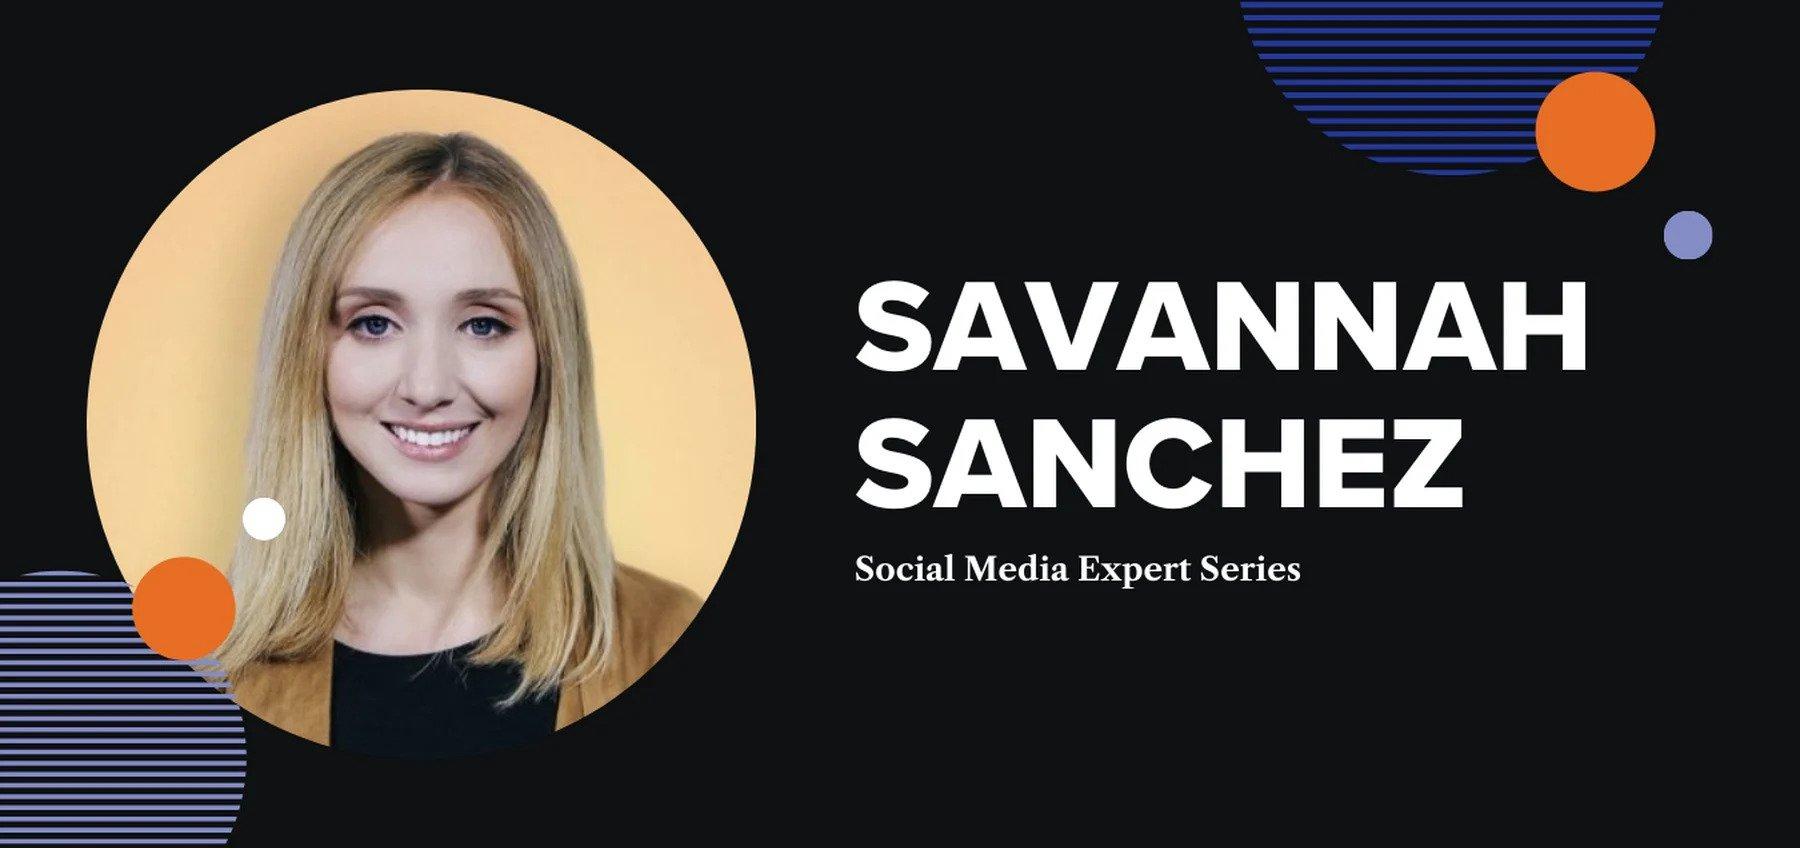 Social Media Expert Series: Q&A with Savannah Sanchez